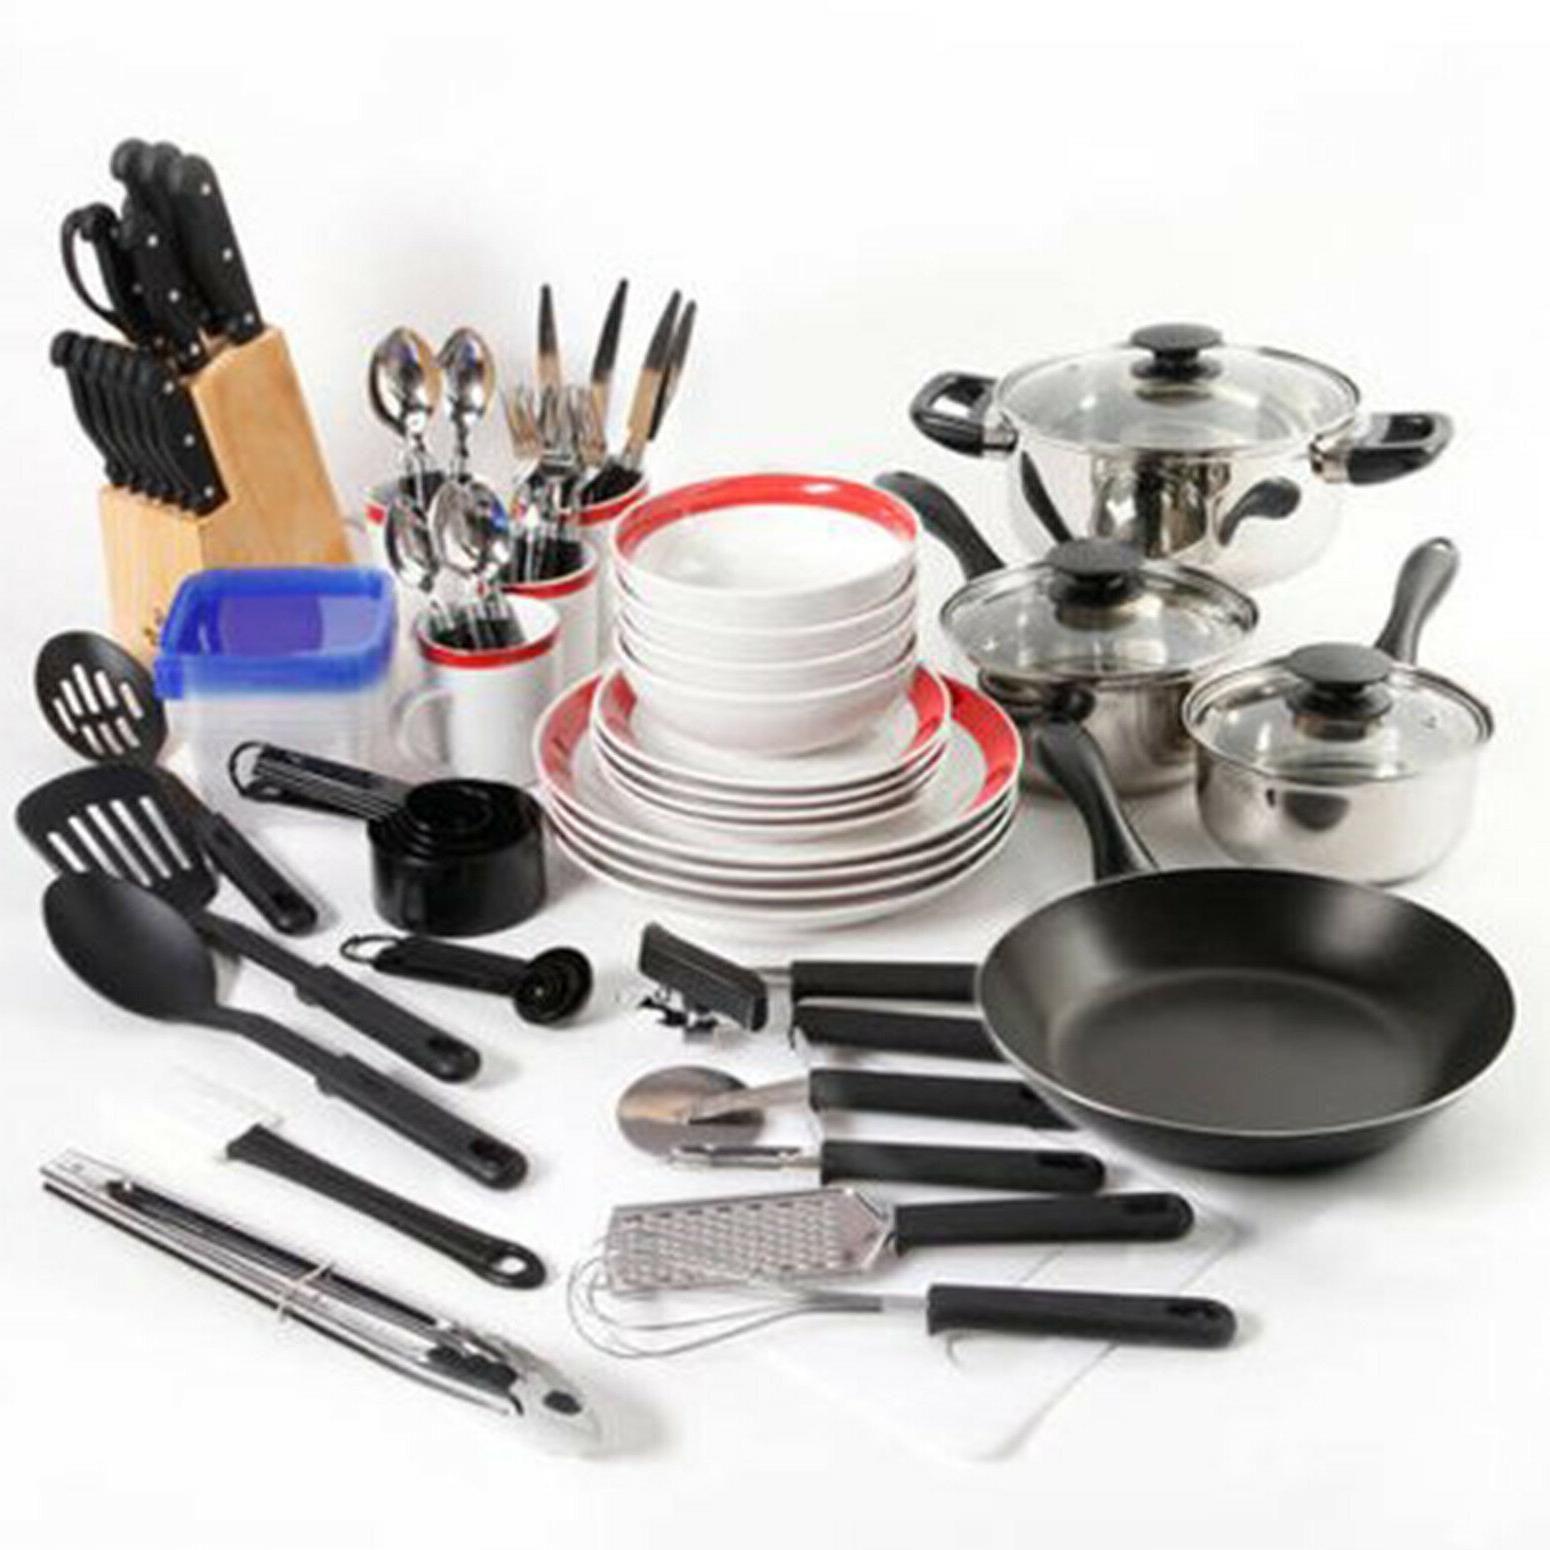 Essential Total Kitchen 83 Piece Combo Set Black Kitchen Essentials Kitchen Cookware Utensil